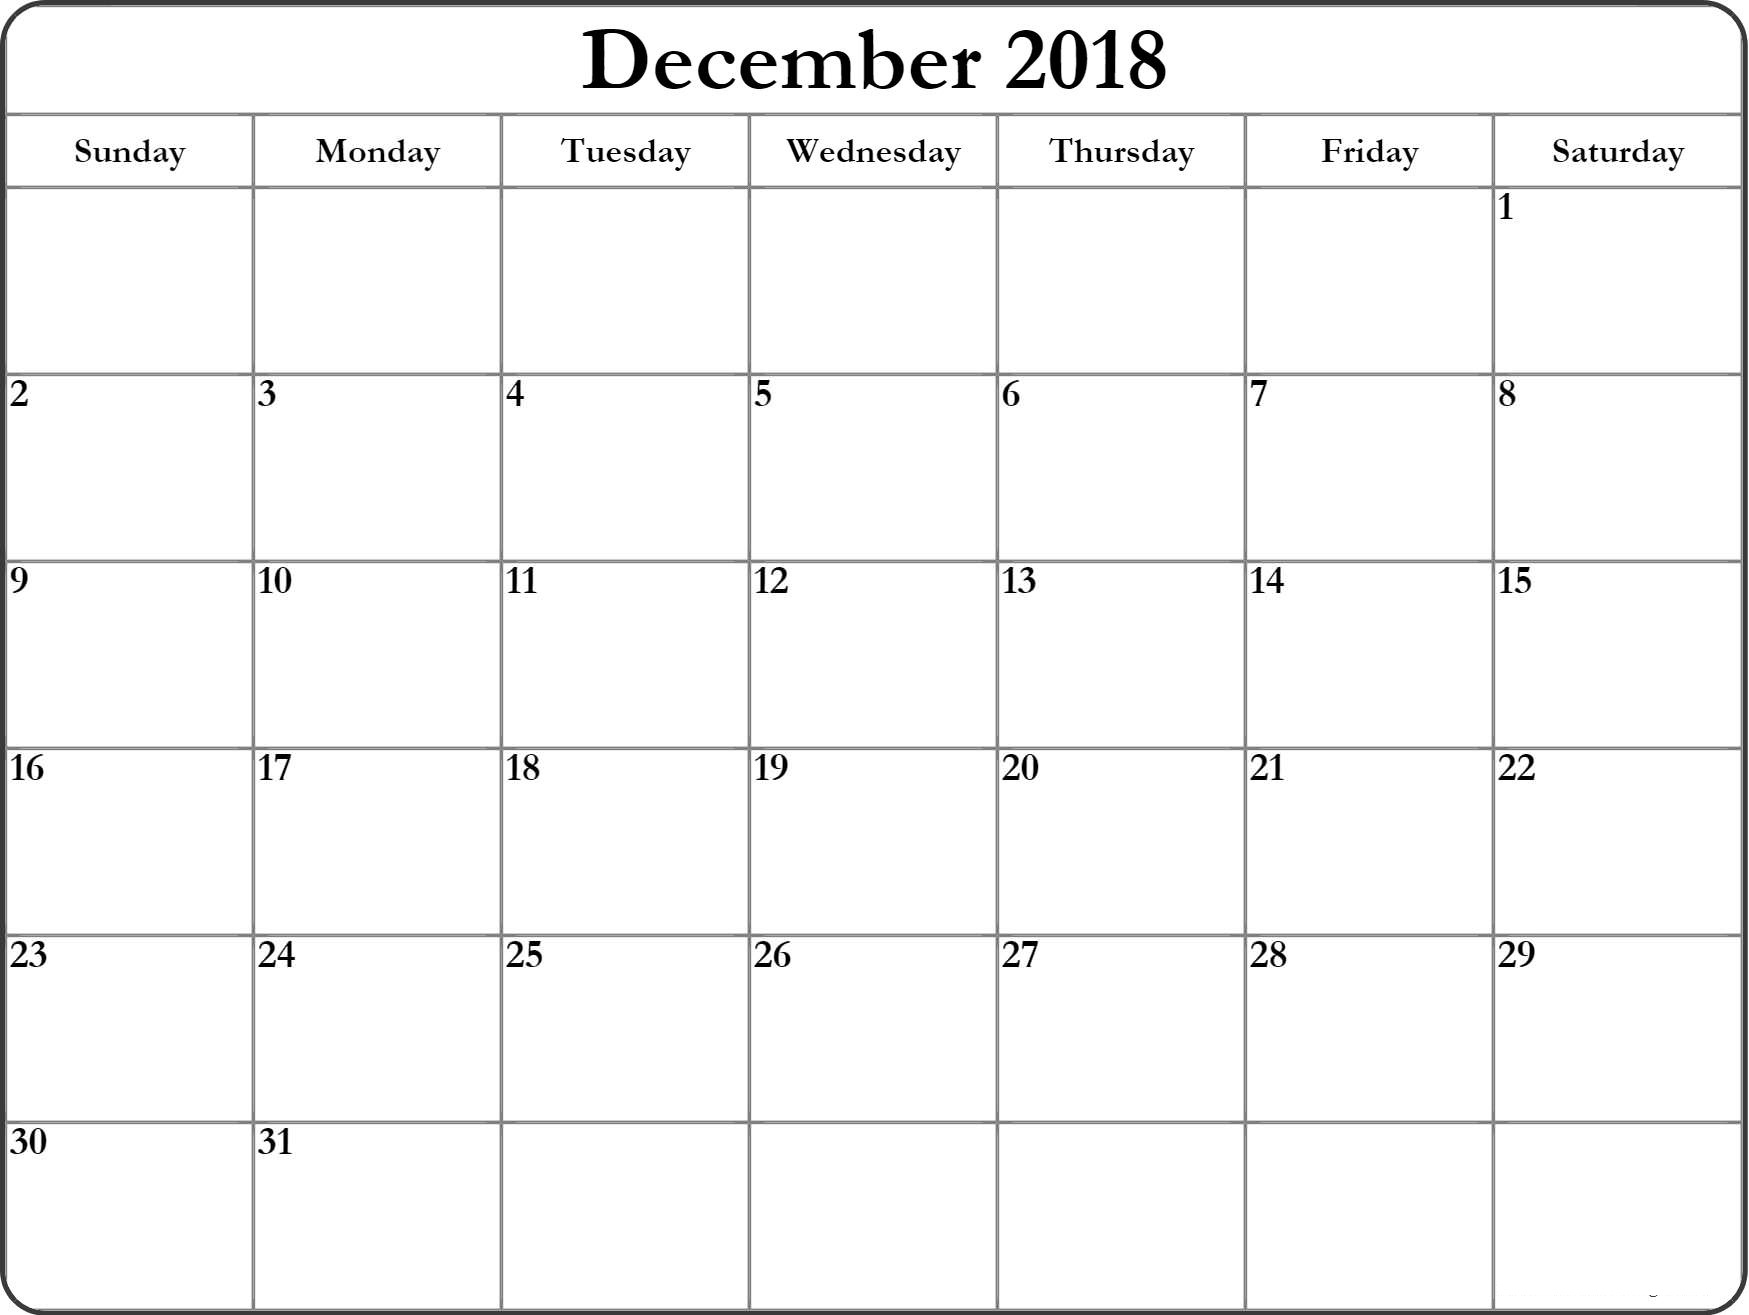 Calendar December 2018 In Word - Printable Calendar 2019| Blank with Blank Printable Calendars December